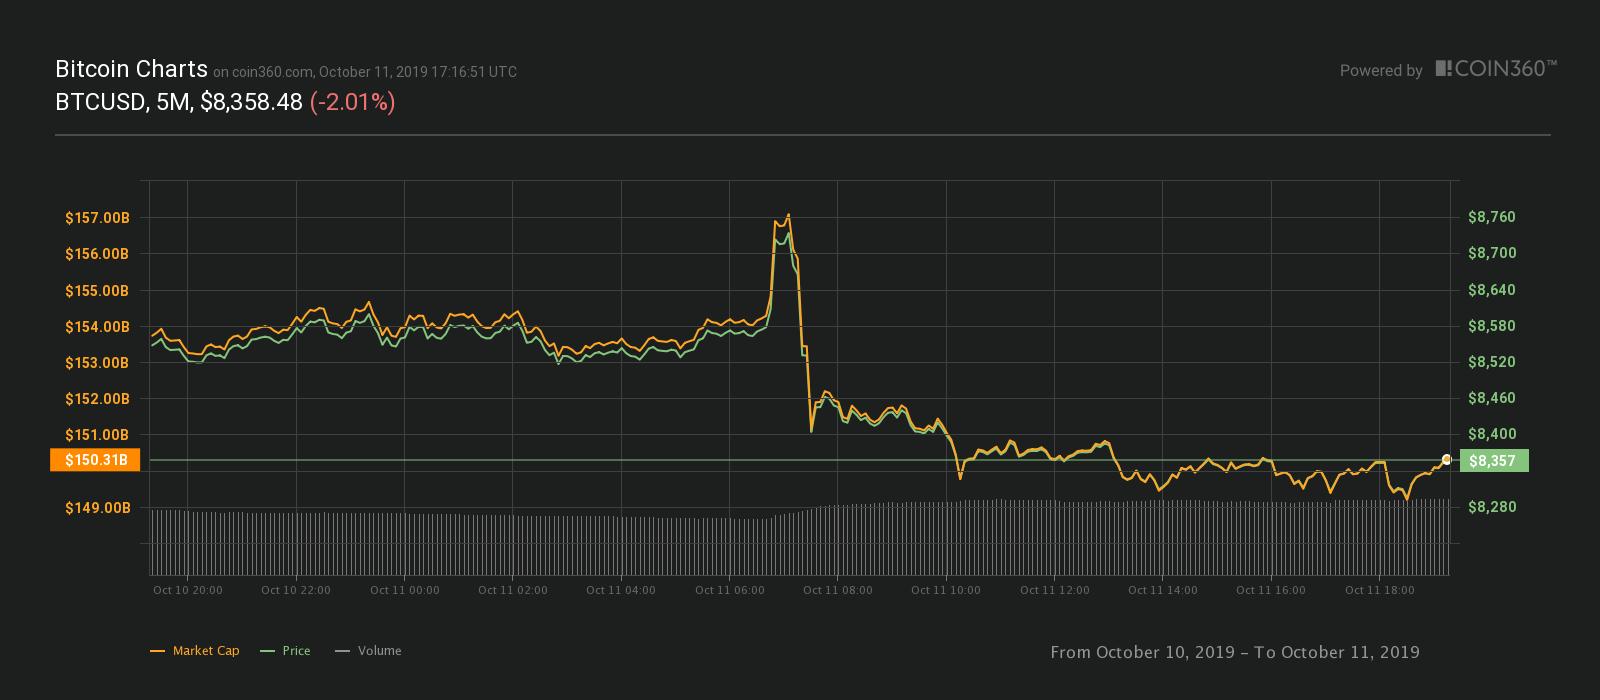 Gráfico de precios de 24 horas de Bitcoin. Fuente: Coin360